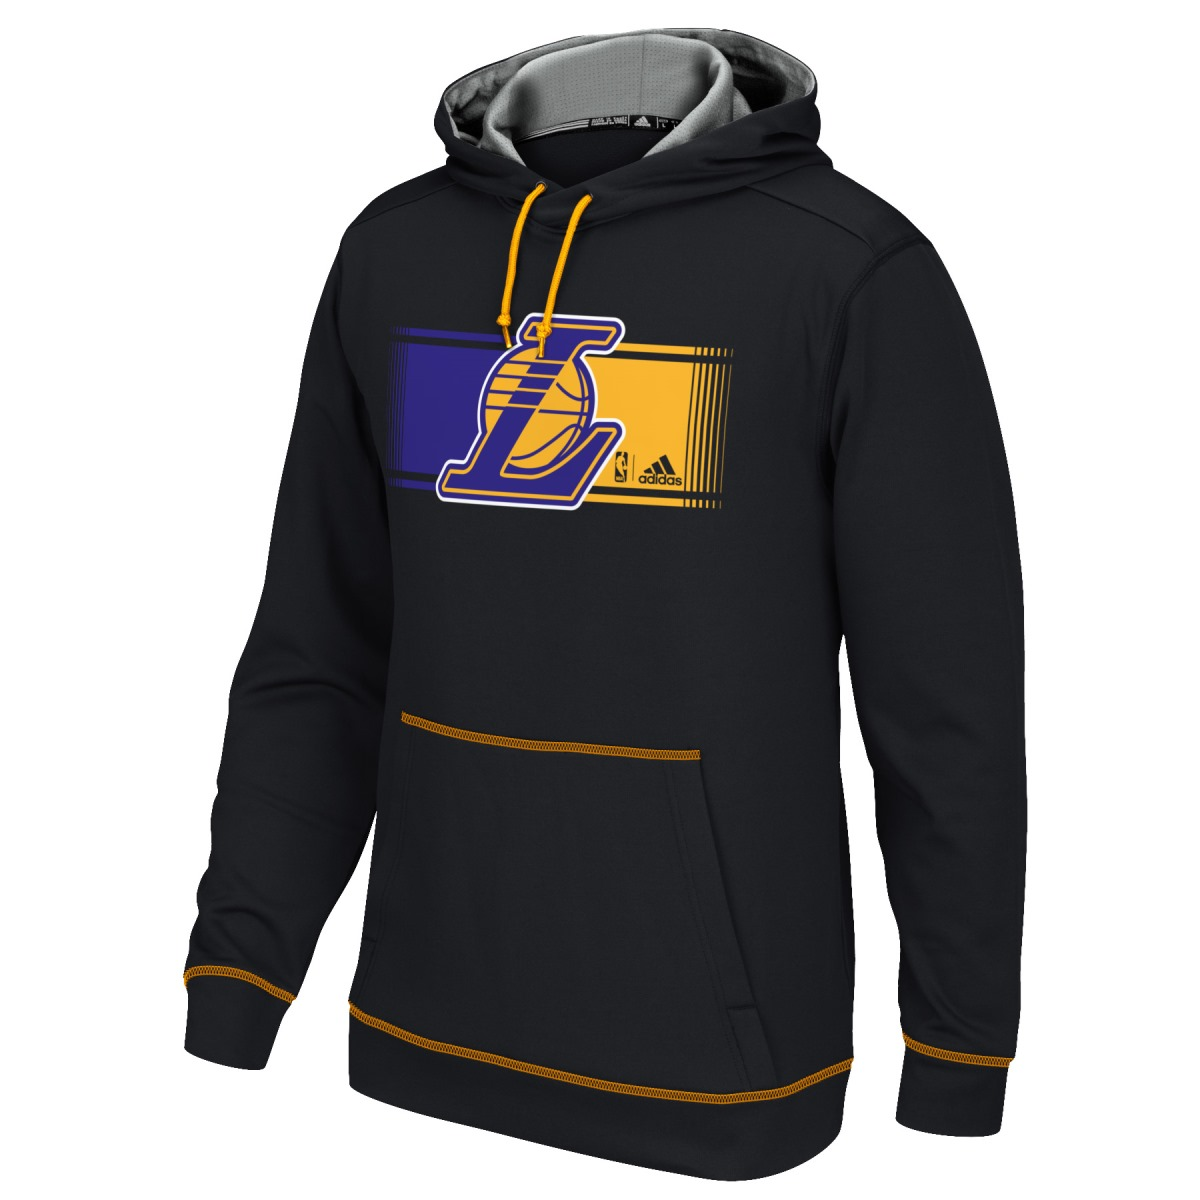 "Los Angeles Lakers Adidas 2015 NBA ""Tip-Off"" Men's Climawarm Hooded Sweatshirt"